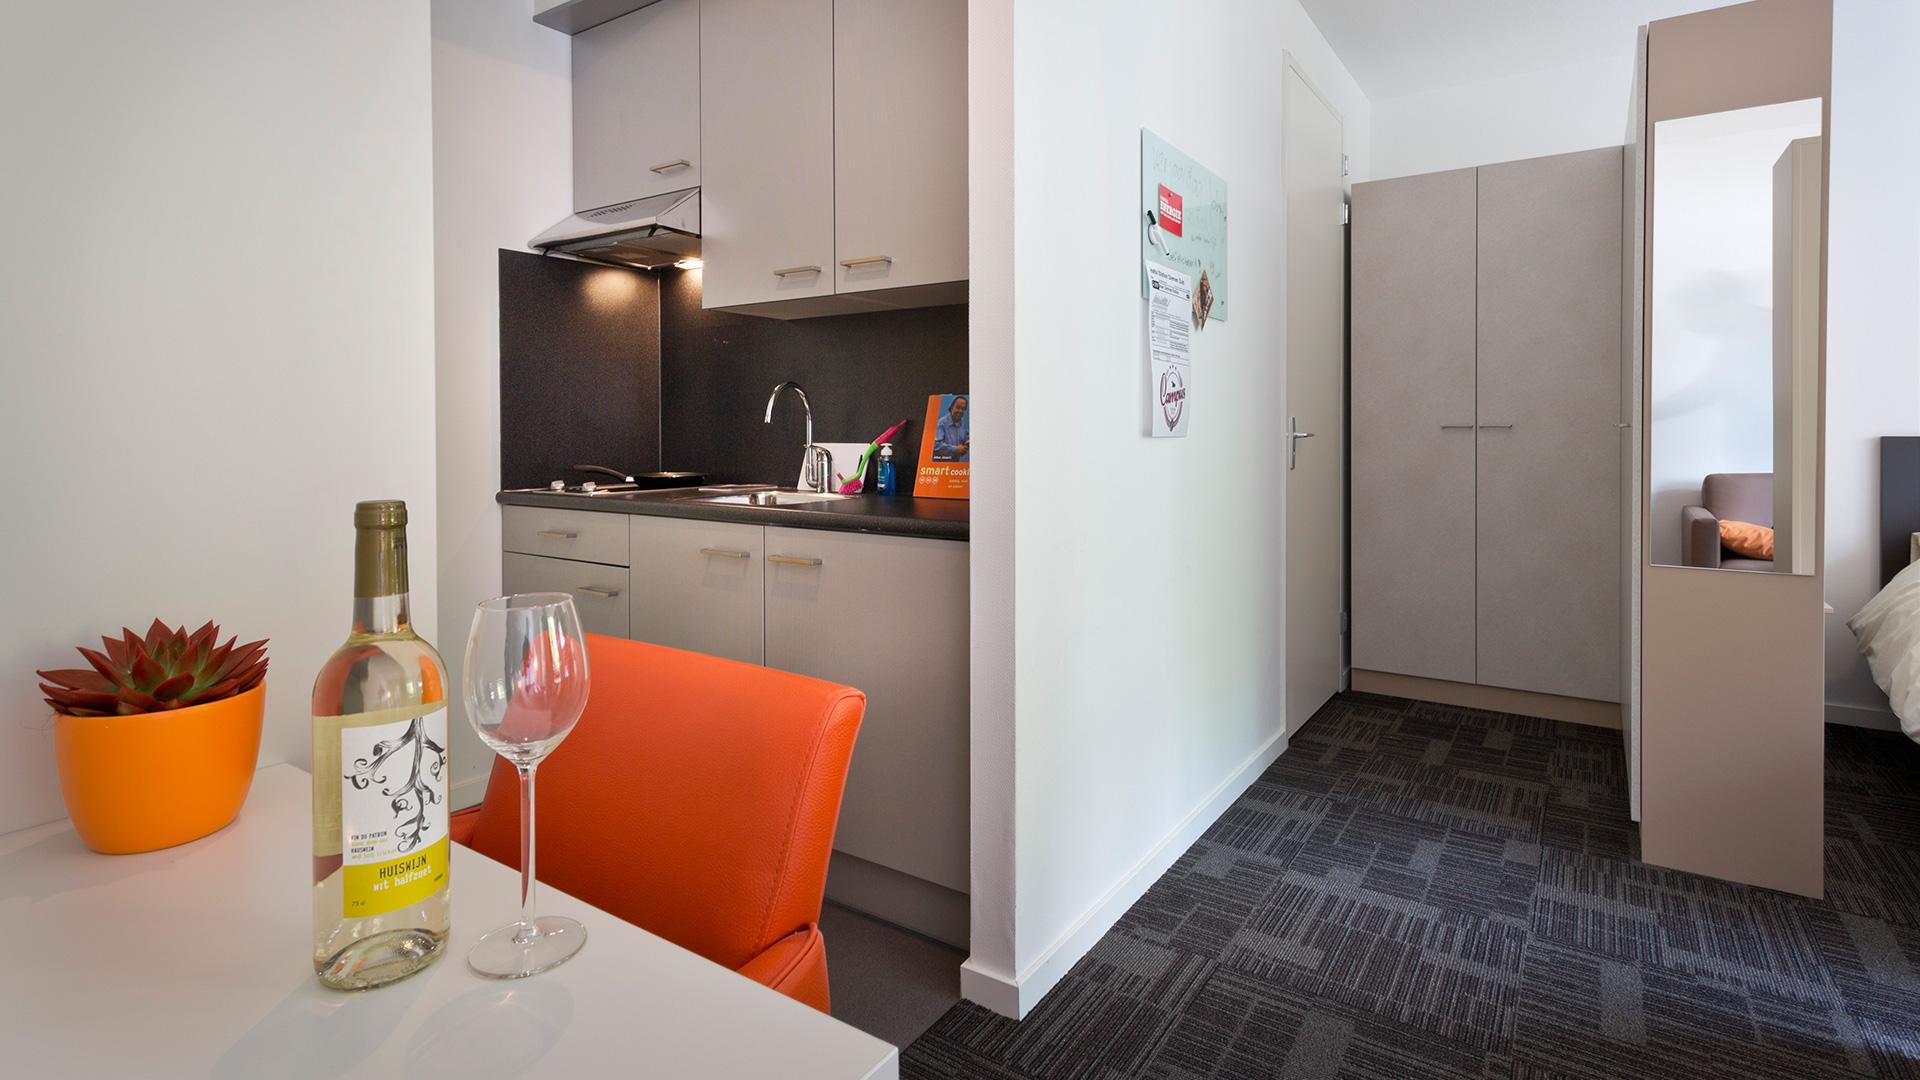 Home Design Keukens : Designkeukens per week voor slim campusproject